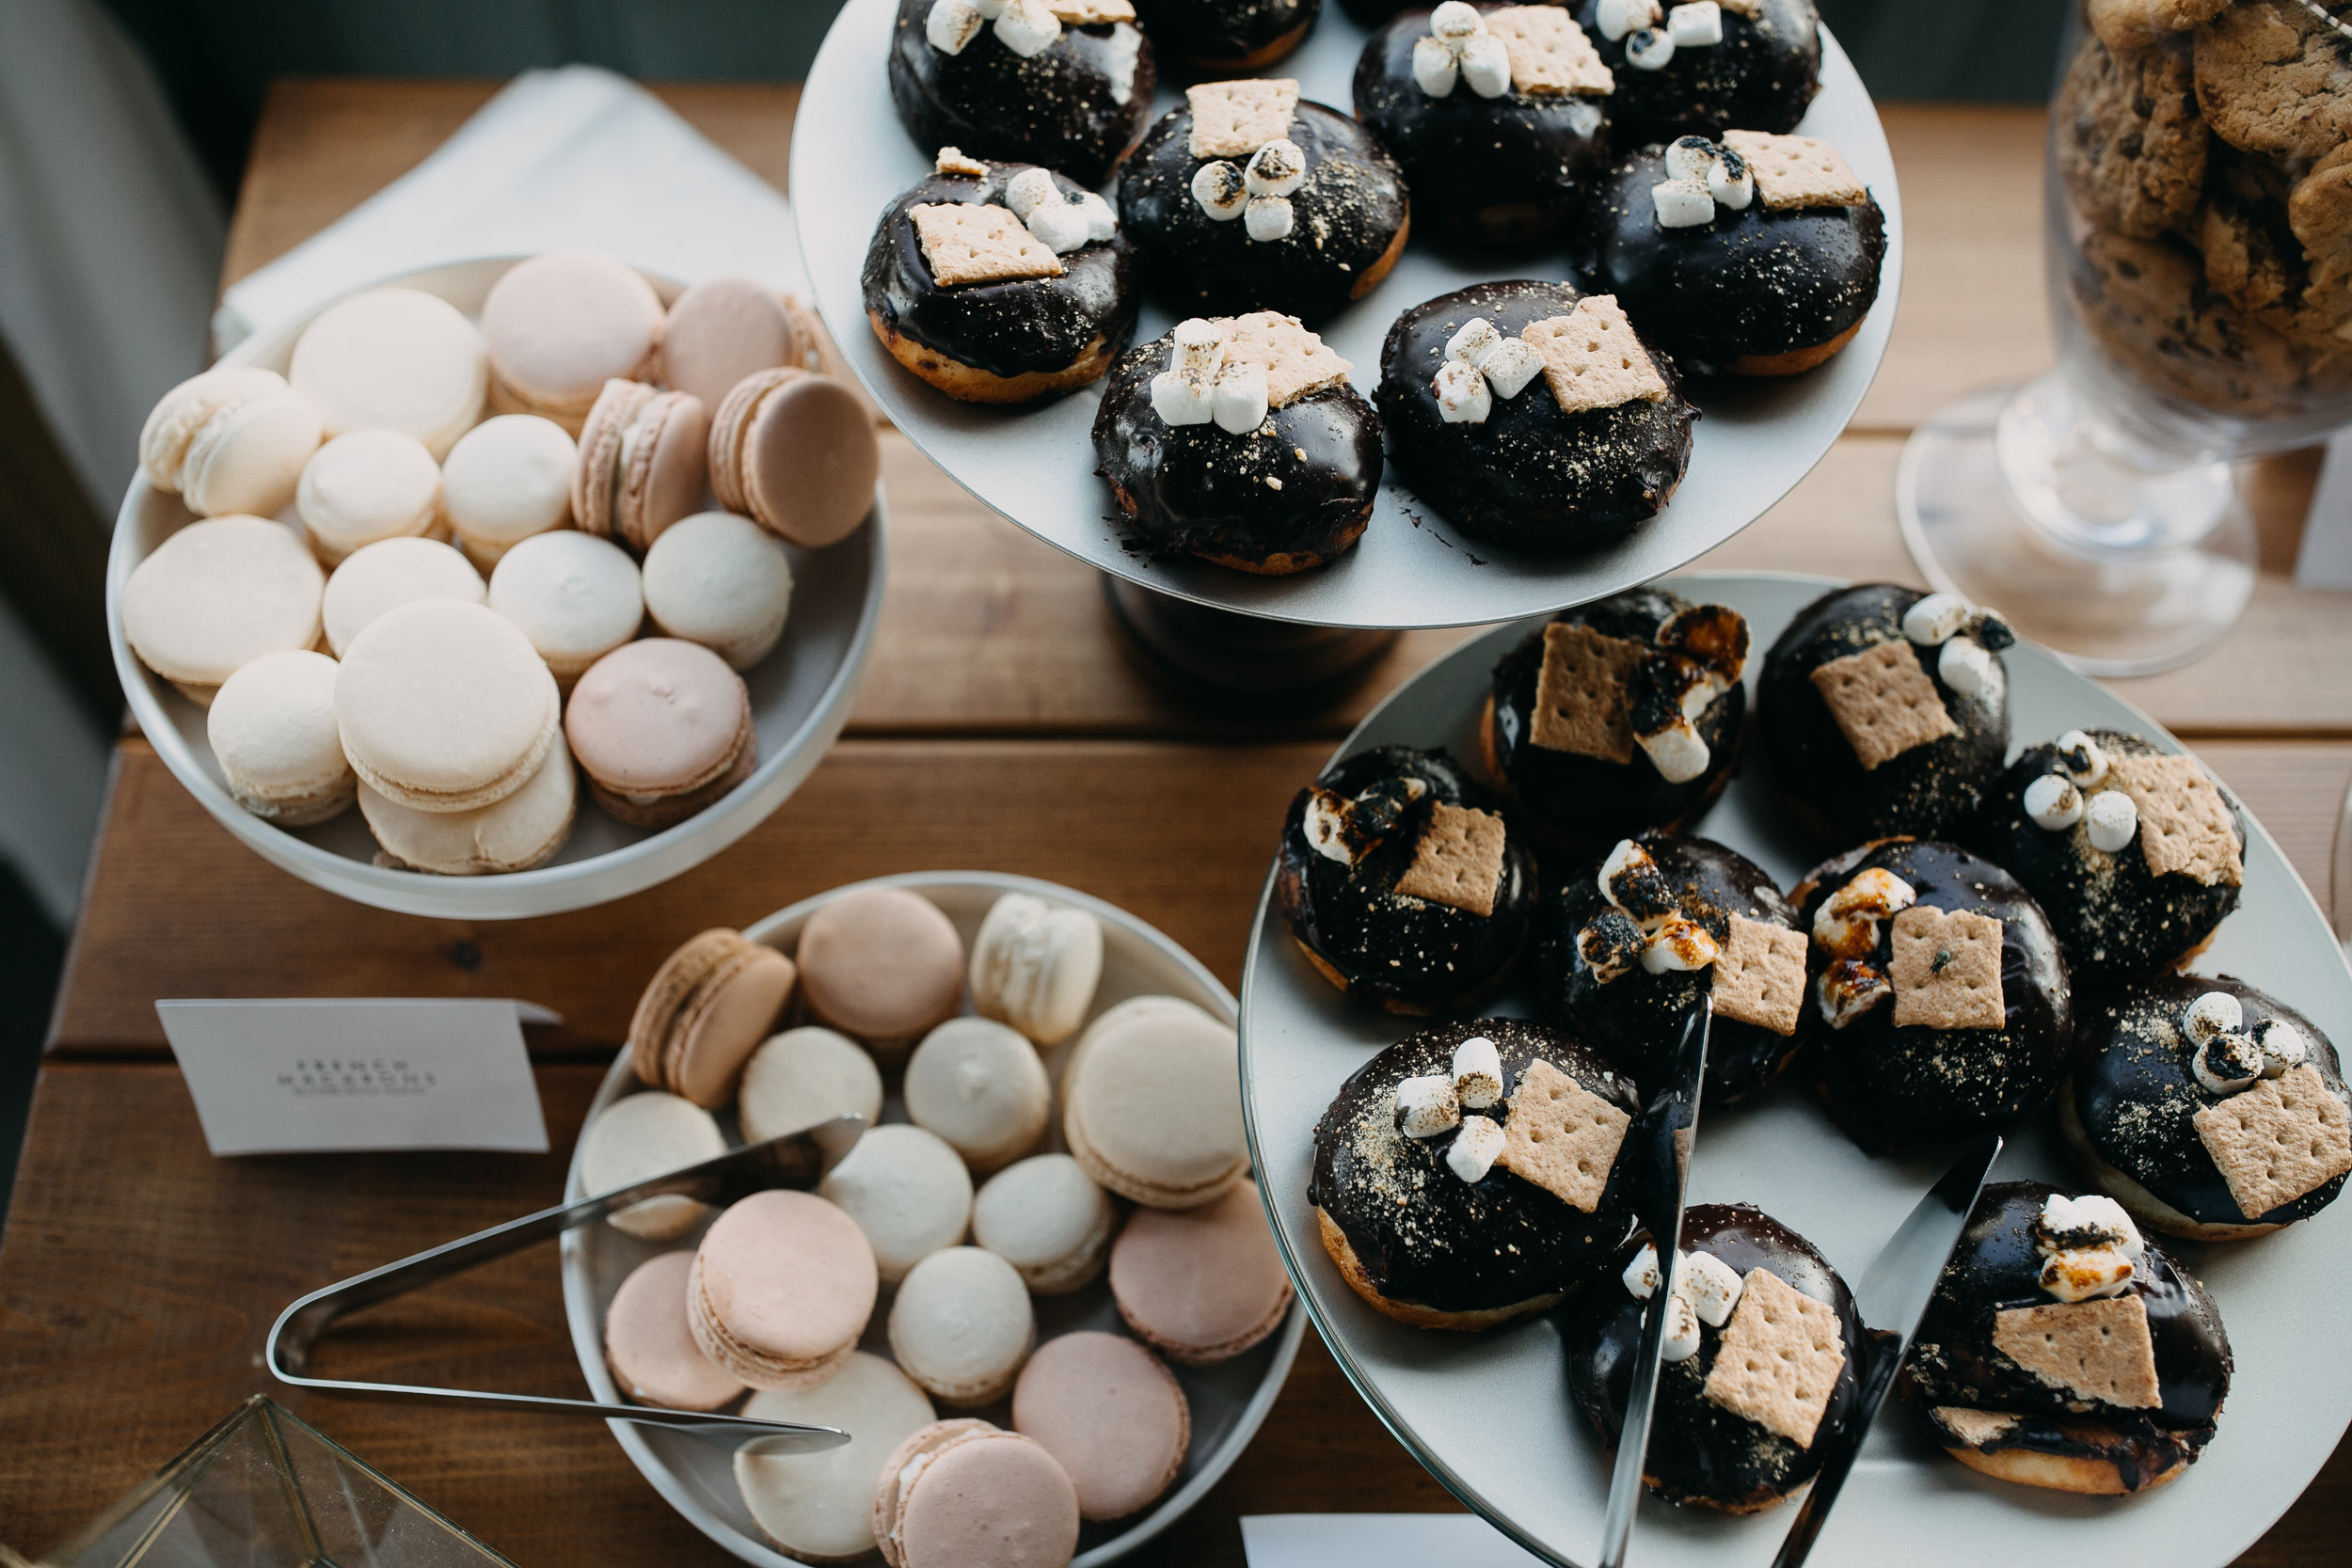 58 wedding doughnuts.jpg